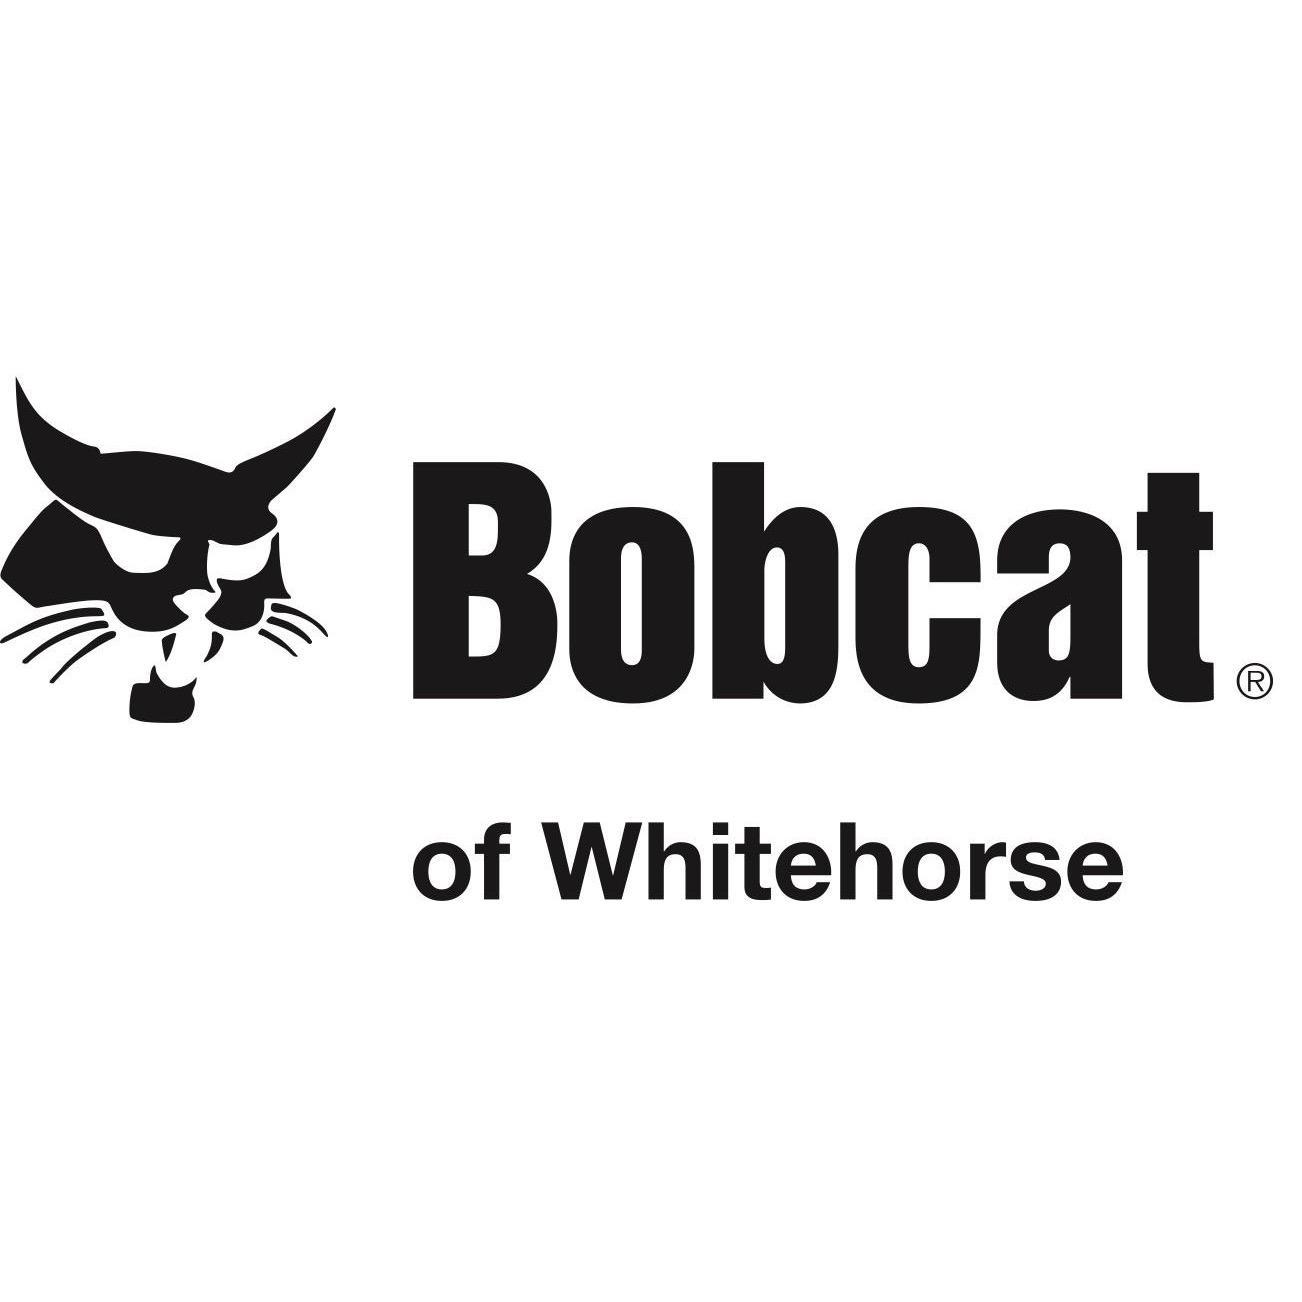 Bobcat of Whitehorse - Whitehorse, YT Y1A 2Z7 - (867)633-4426 | ShowMeLocal.com